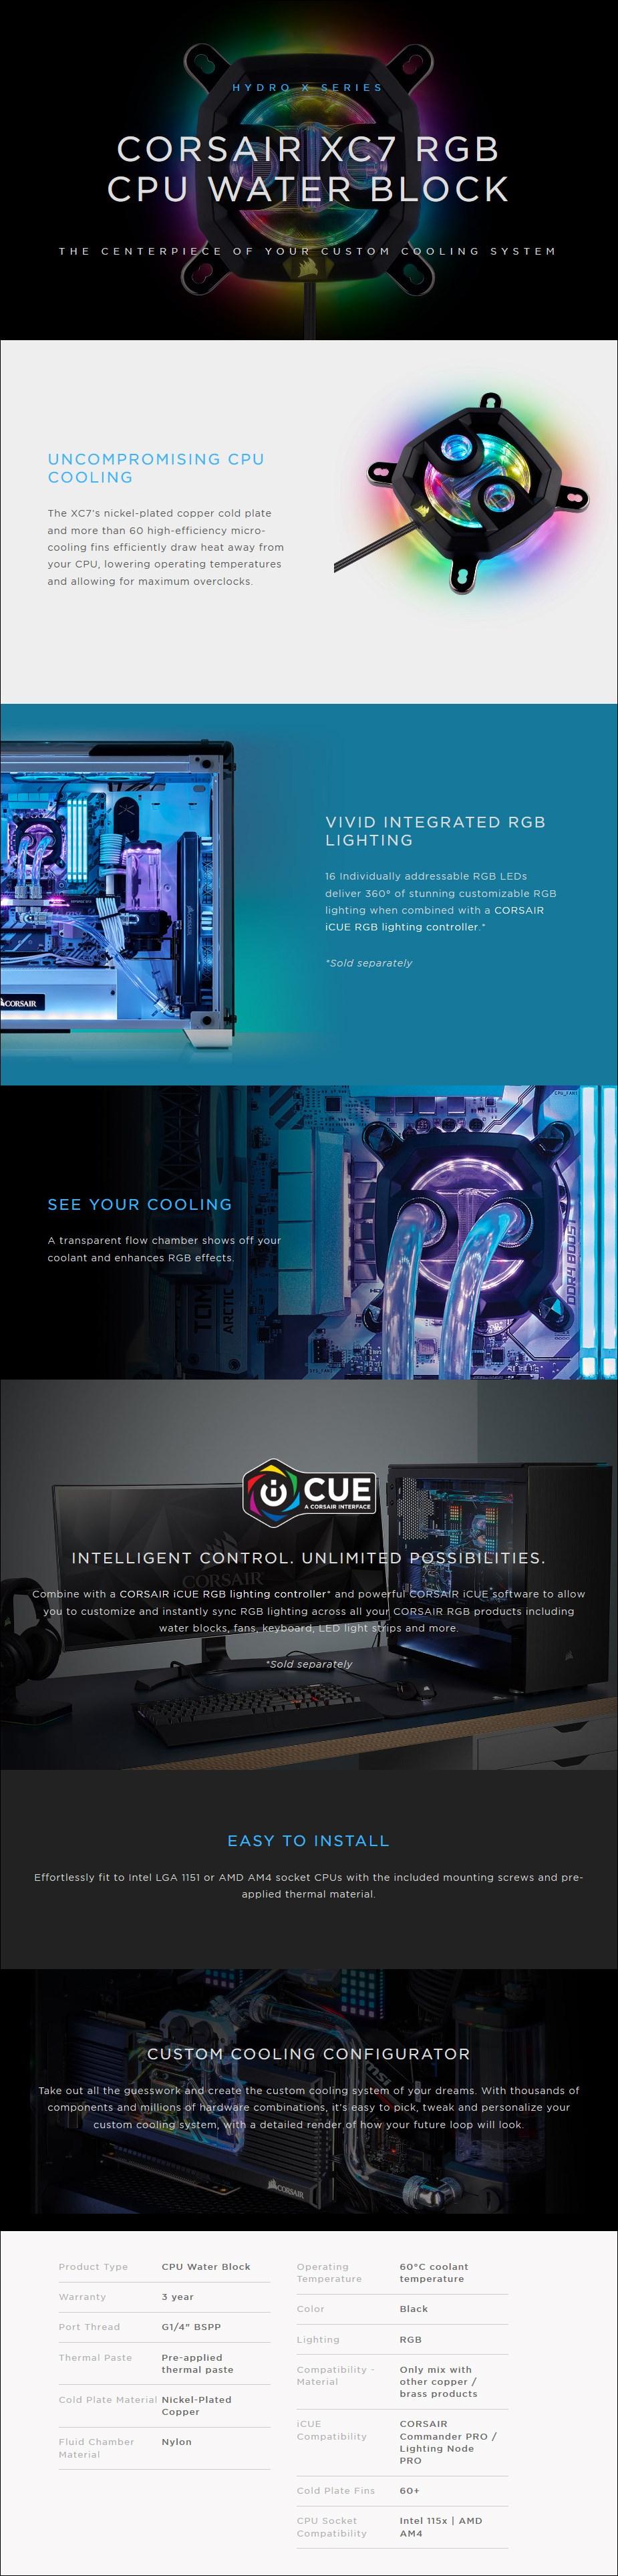 Corsair Hydro X Series XC7 RGB CPU Water Block - 115X/AM4 - Overview 1